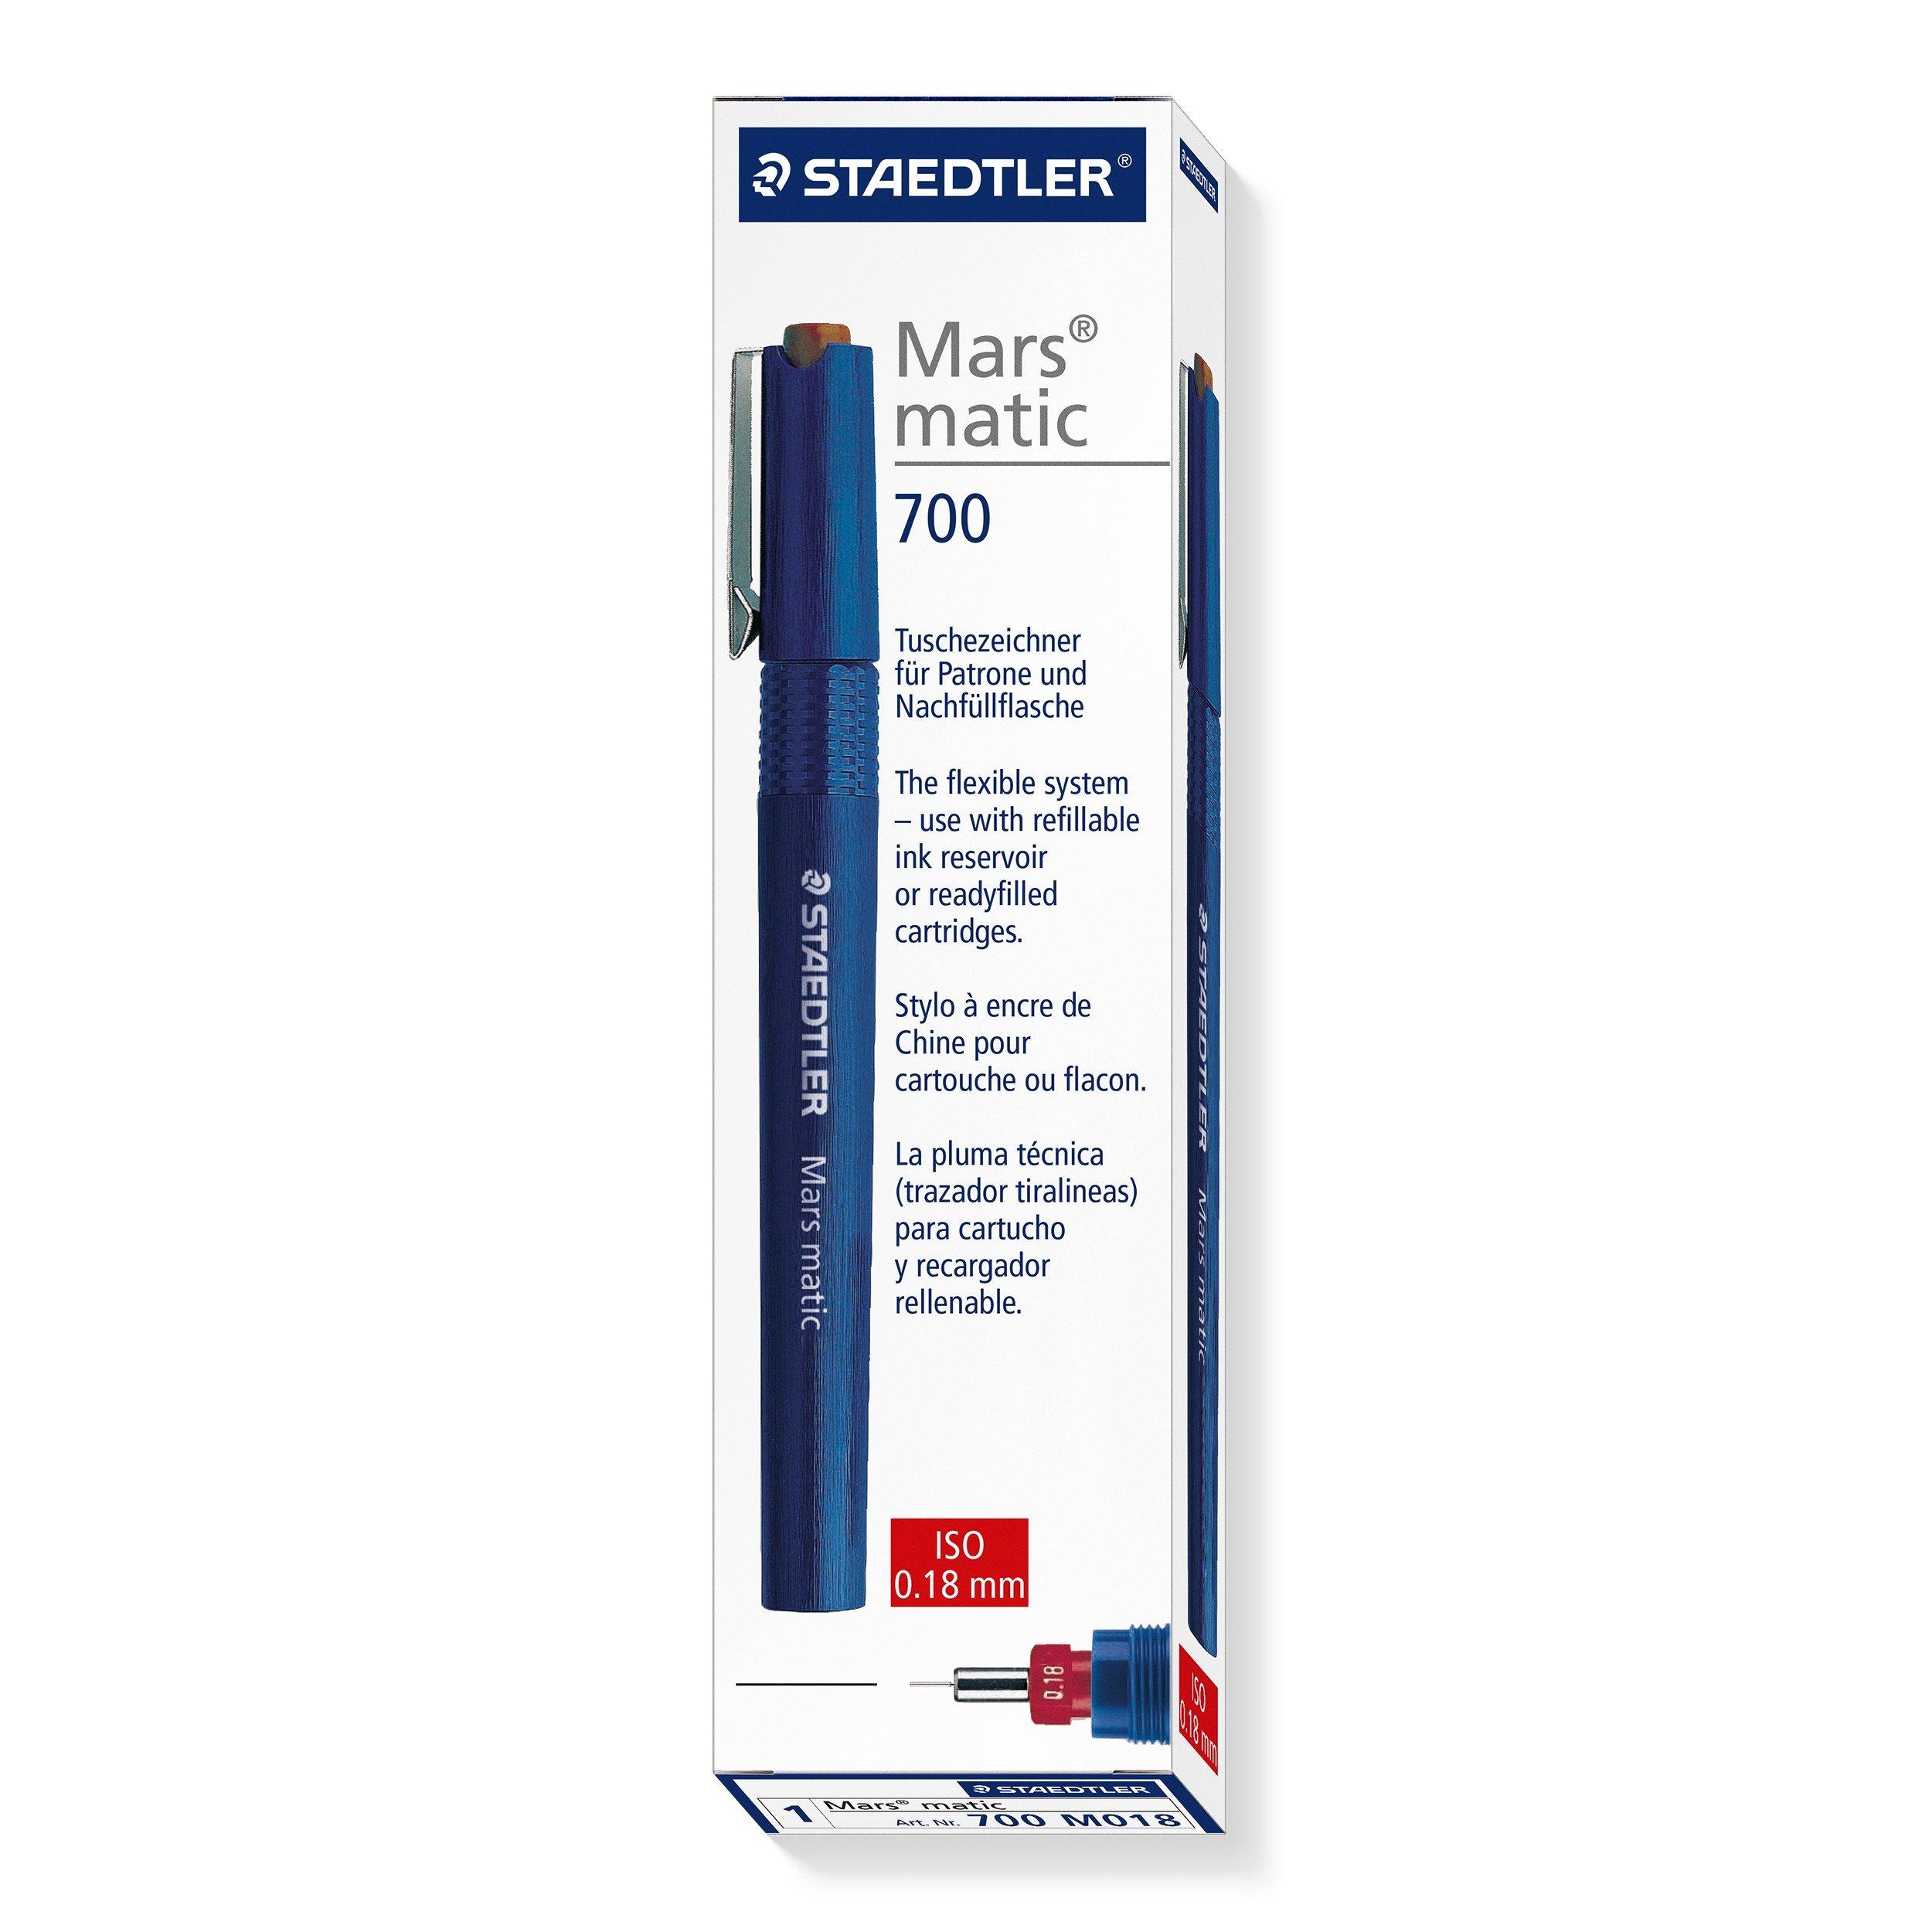 Staedtler Mars Matic 700 M018 Technical Pen - 0.18 mm by Staedtler (Image #2)